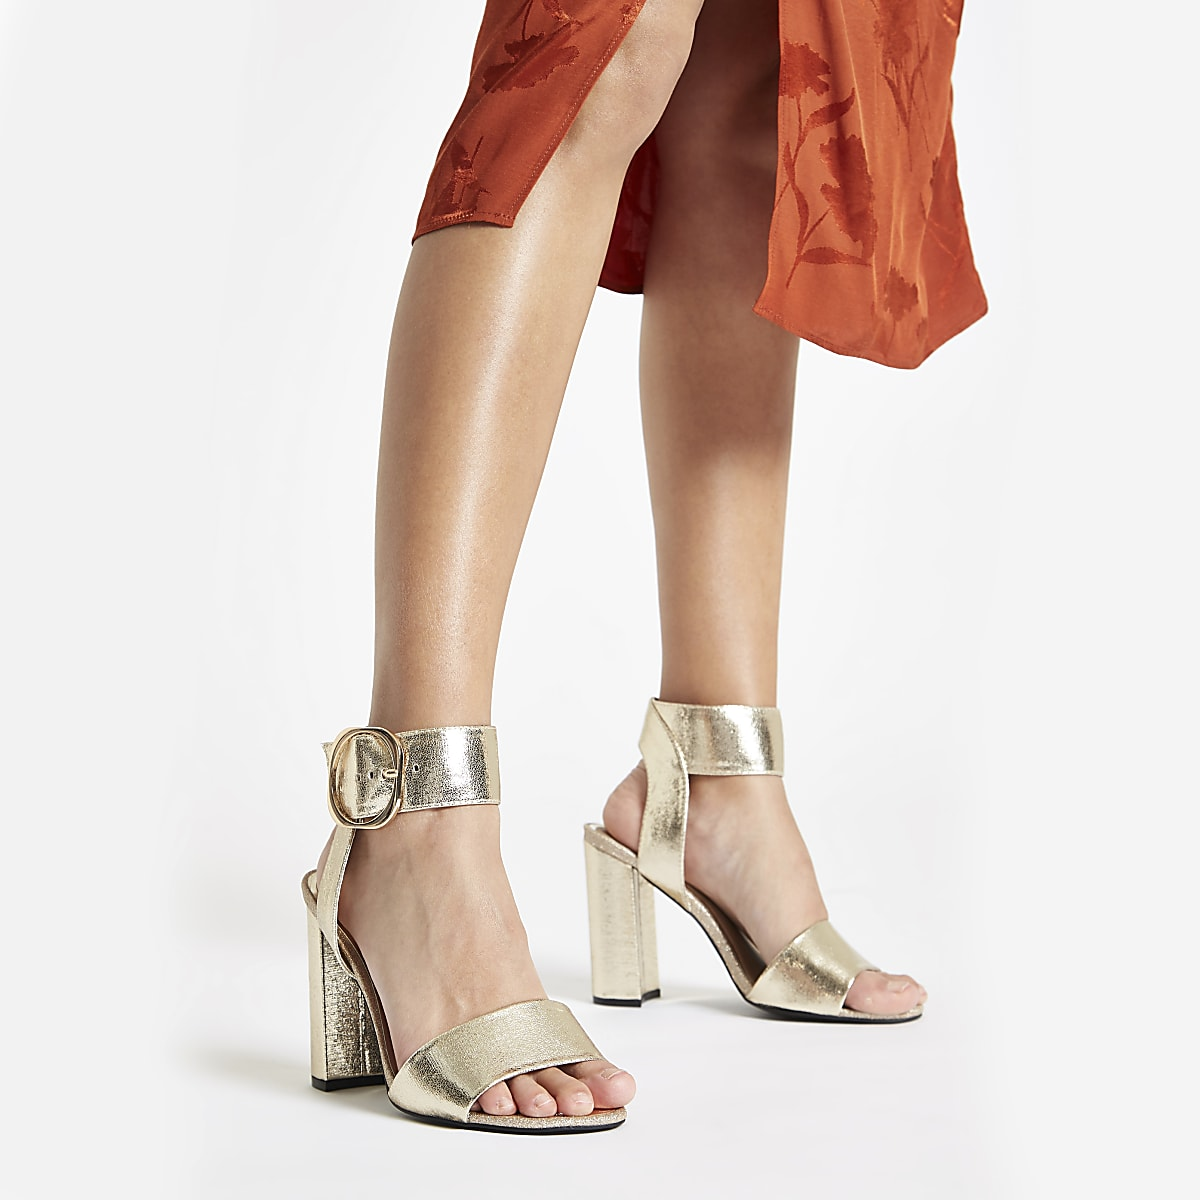 29baef99b38b Gold metallic wide fit block heel sandals - Sandals - Shoes & Boots ...